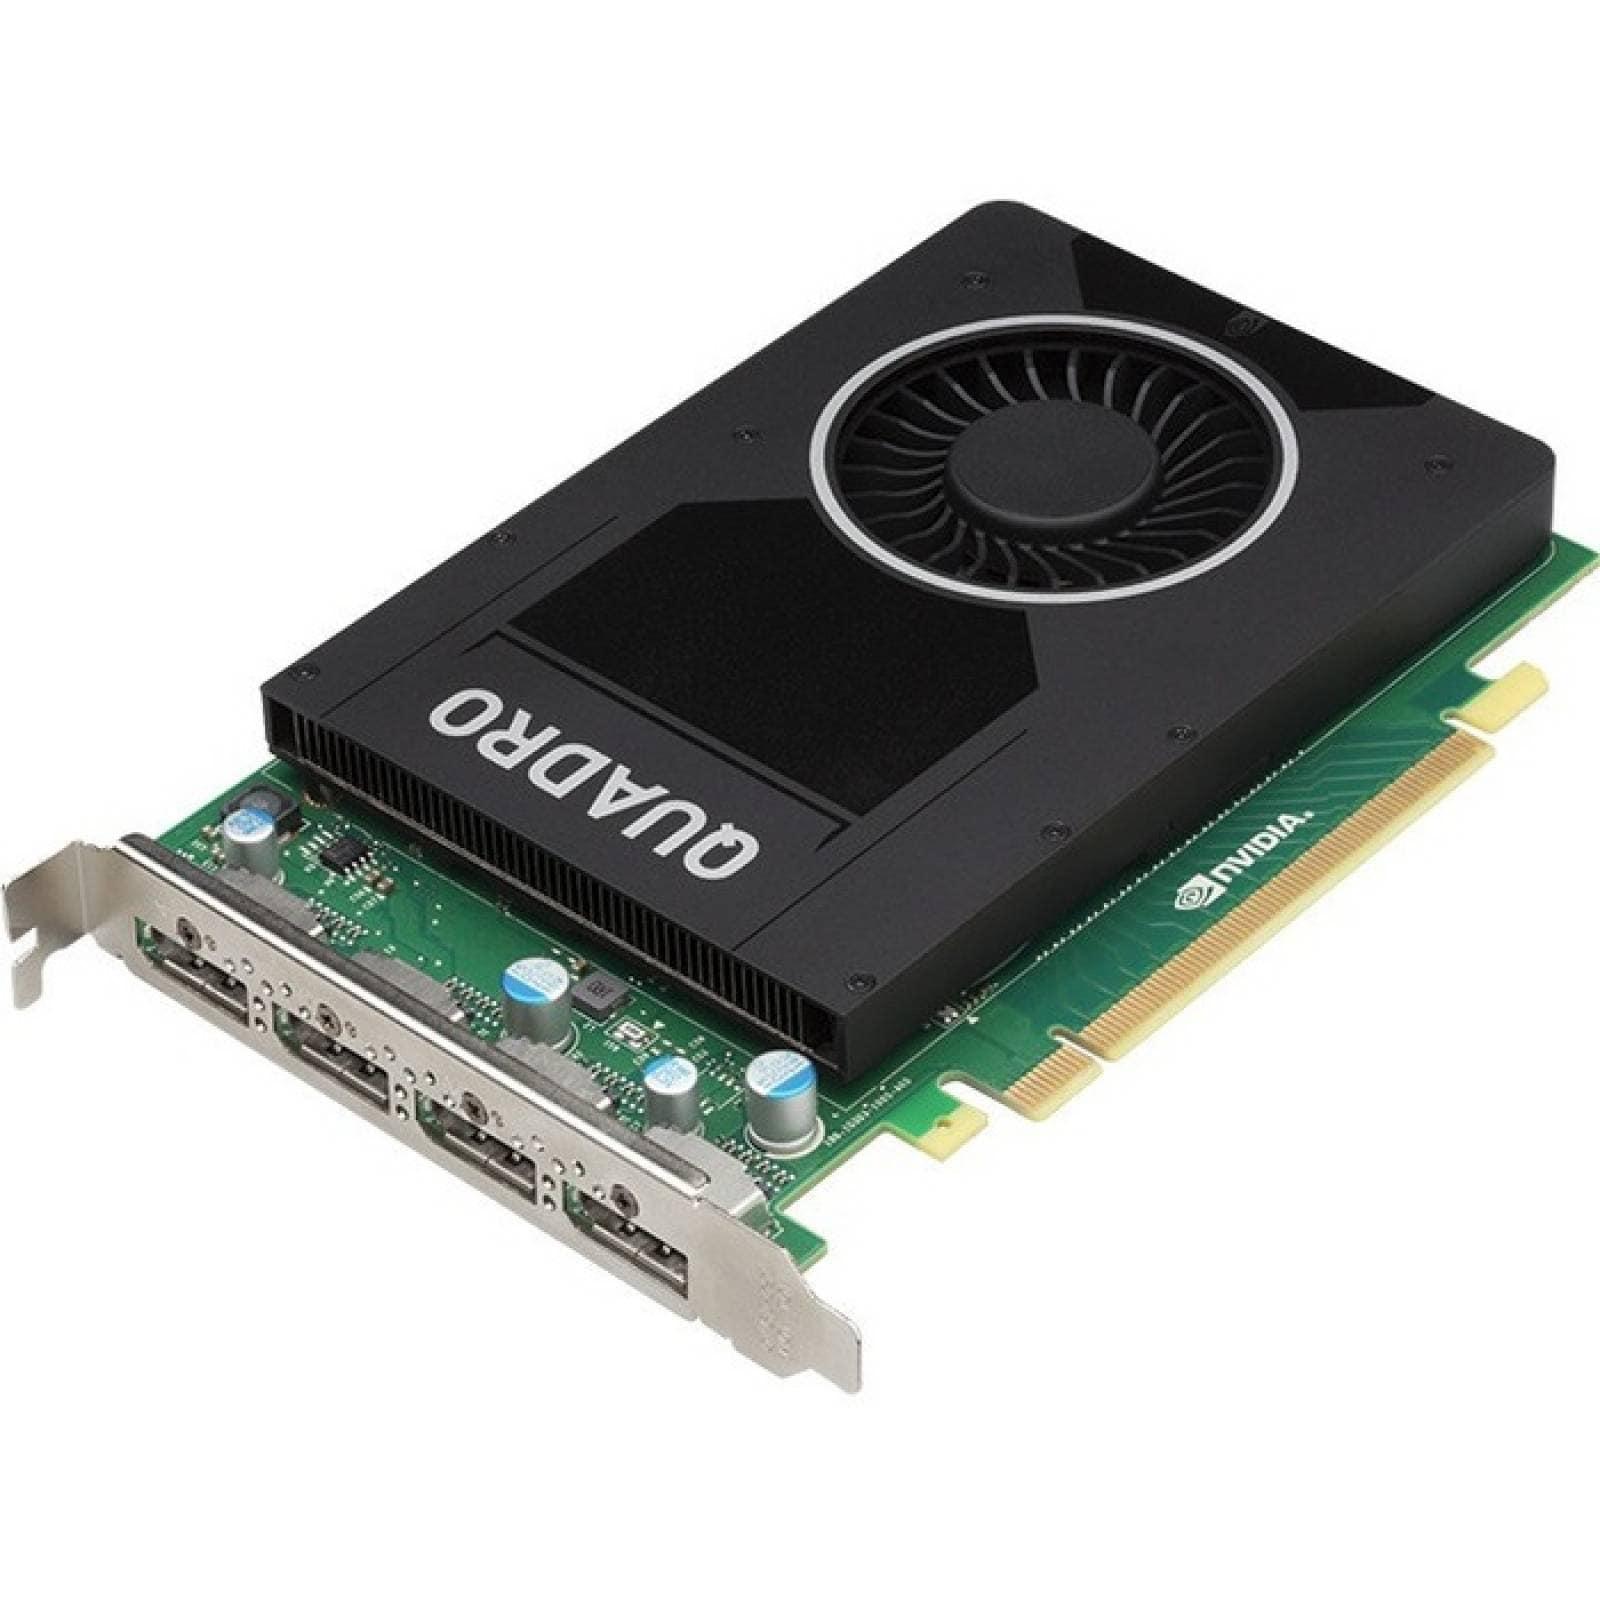 Tarjeta grfica PNY Quadro M2000  4 GB GDDR5  PCI Express 30 x16  Requiere espacio de ranura nica